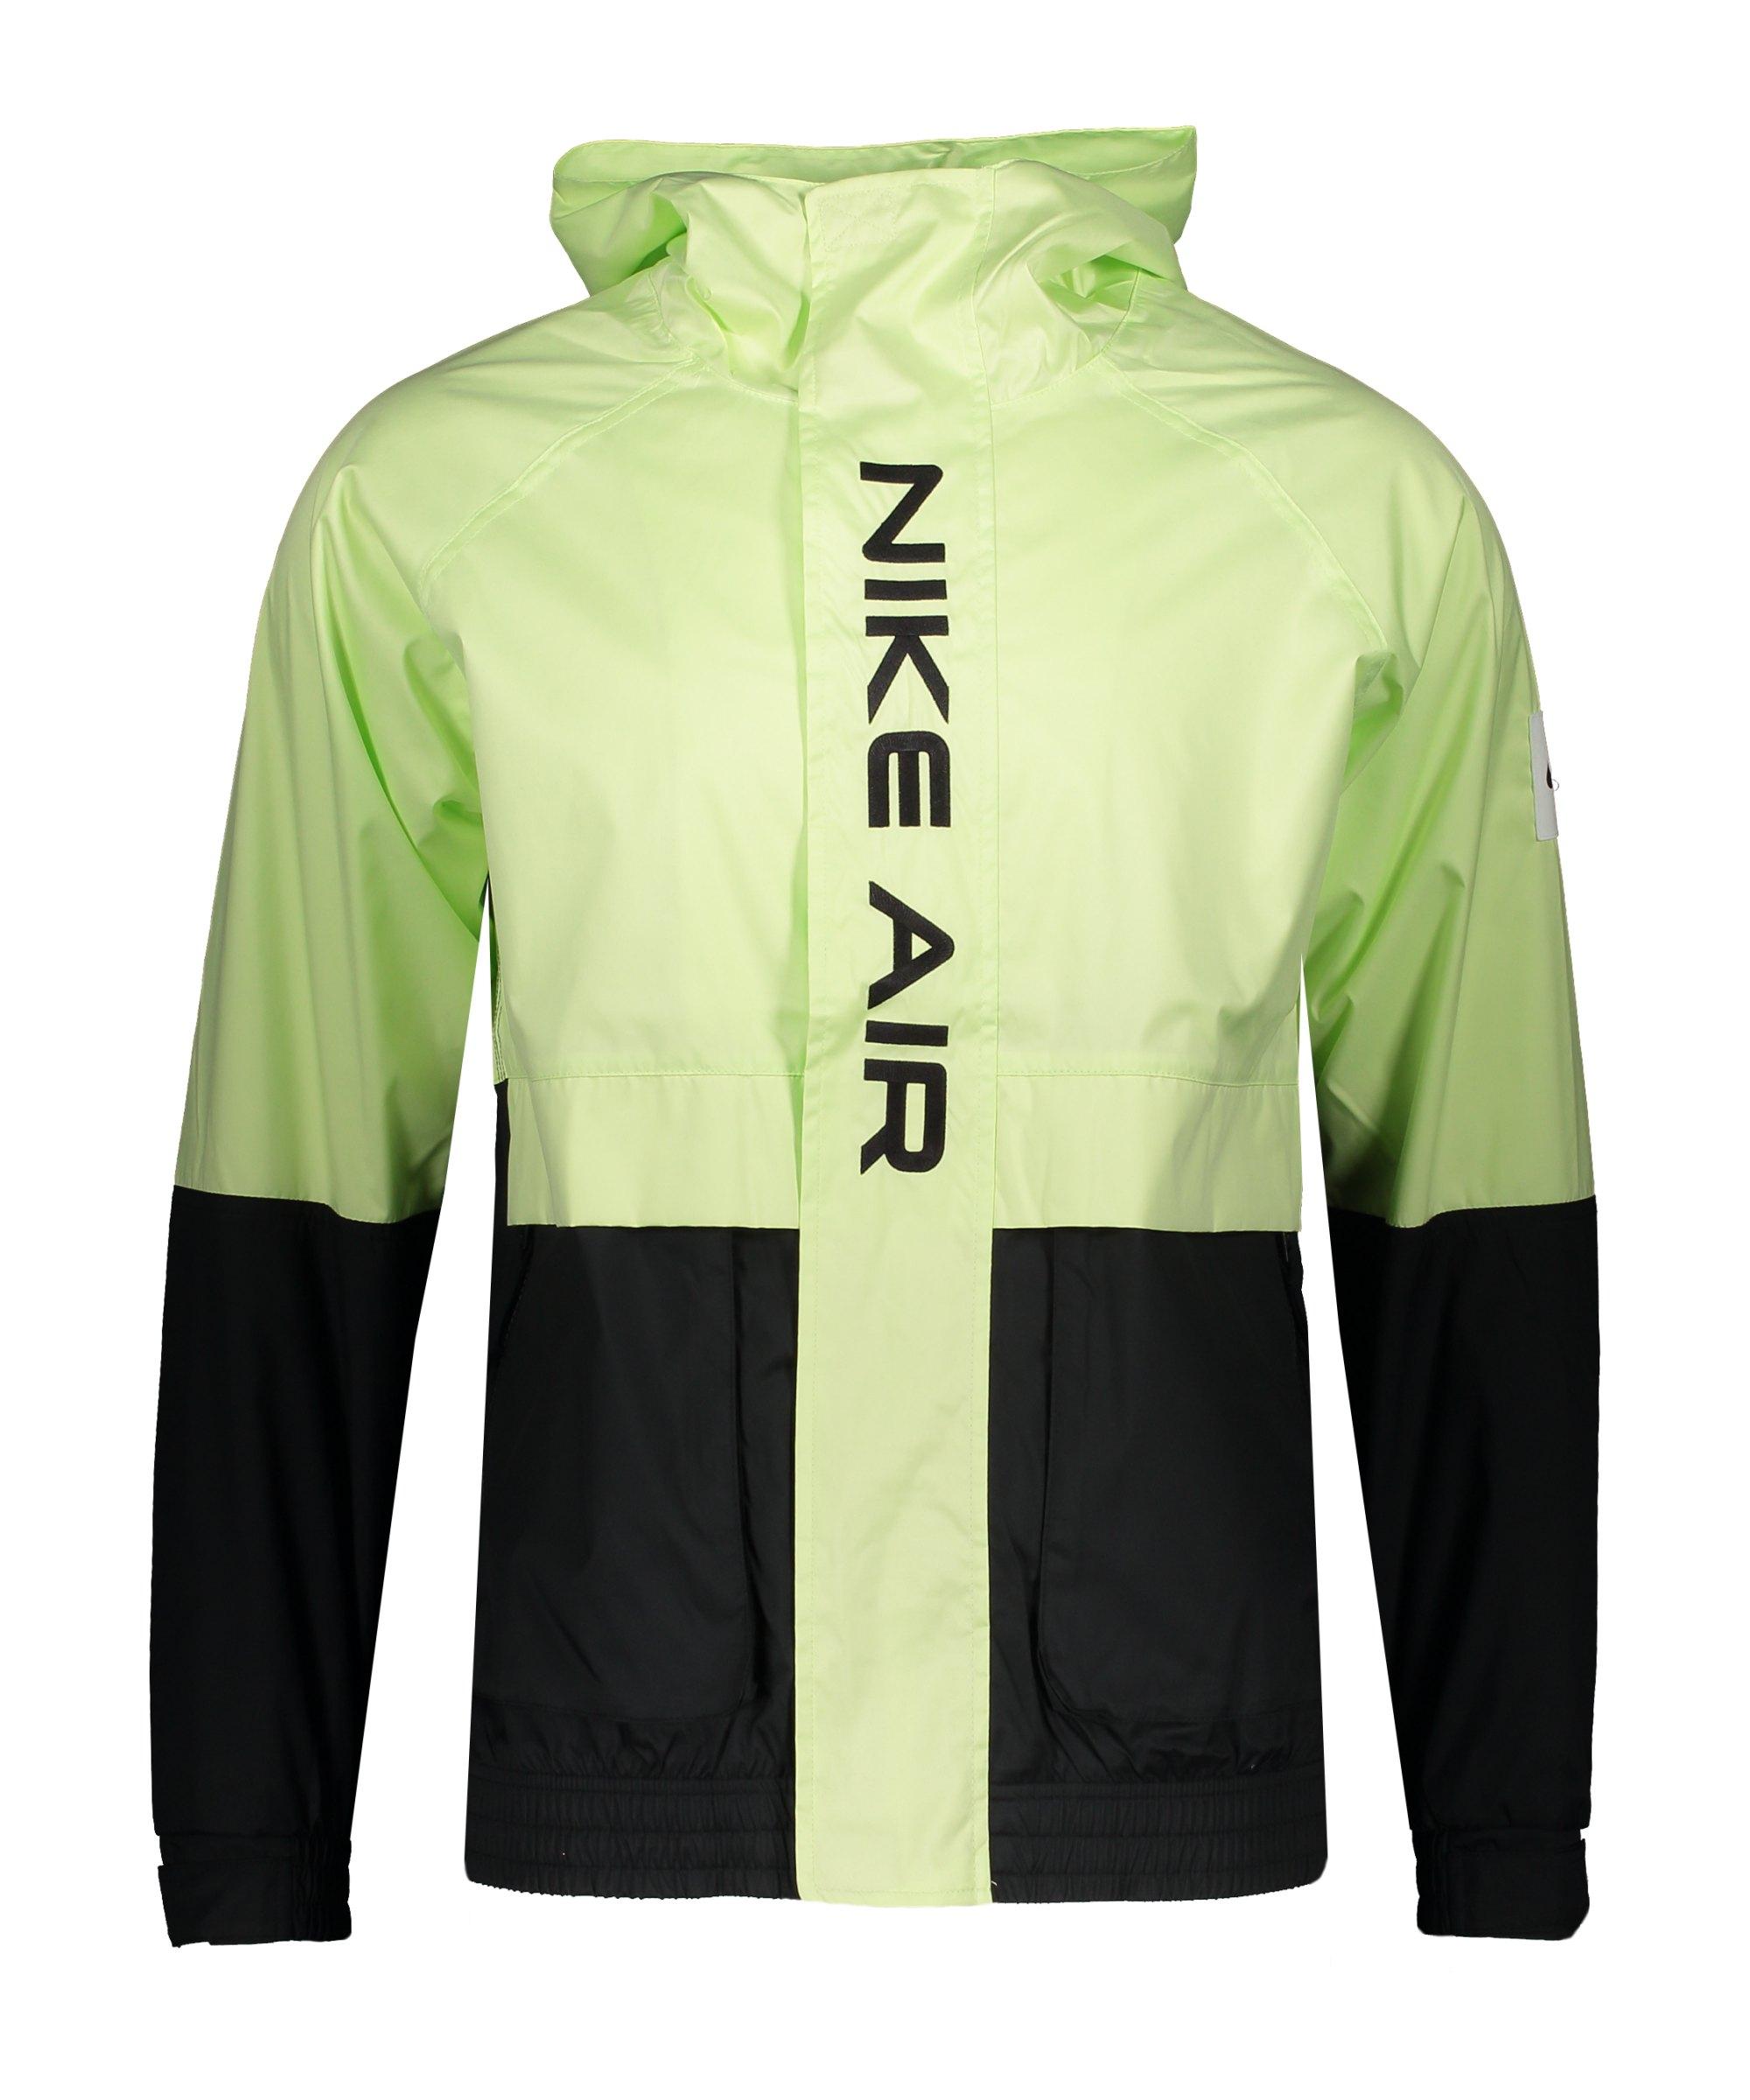 Nike Air Woven Kapuzenjacke Schwarz Grün F011 - schwarz